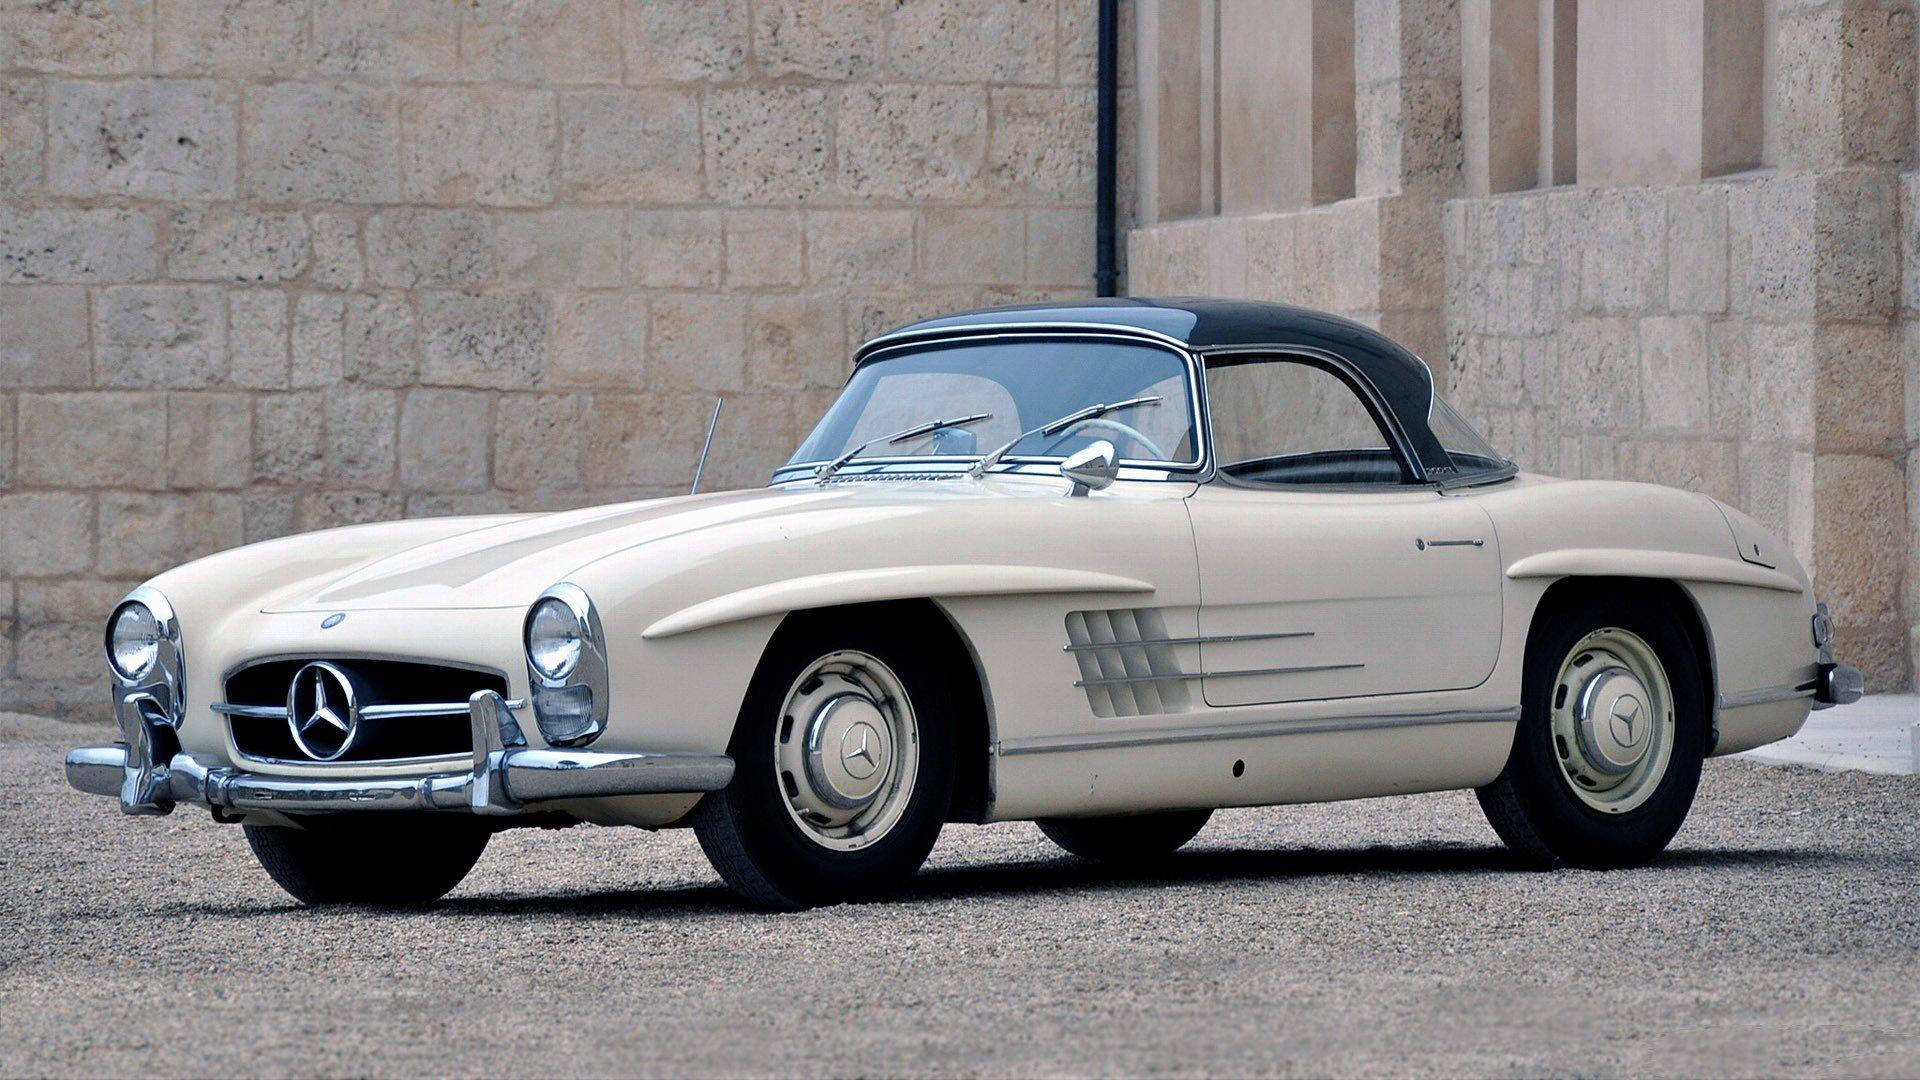 Vintage cars classic cars Mercedes-Benz wallpaper ...